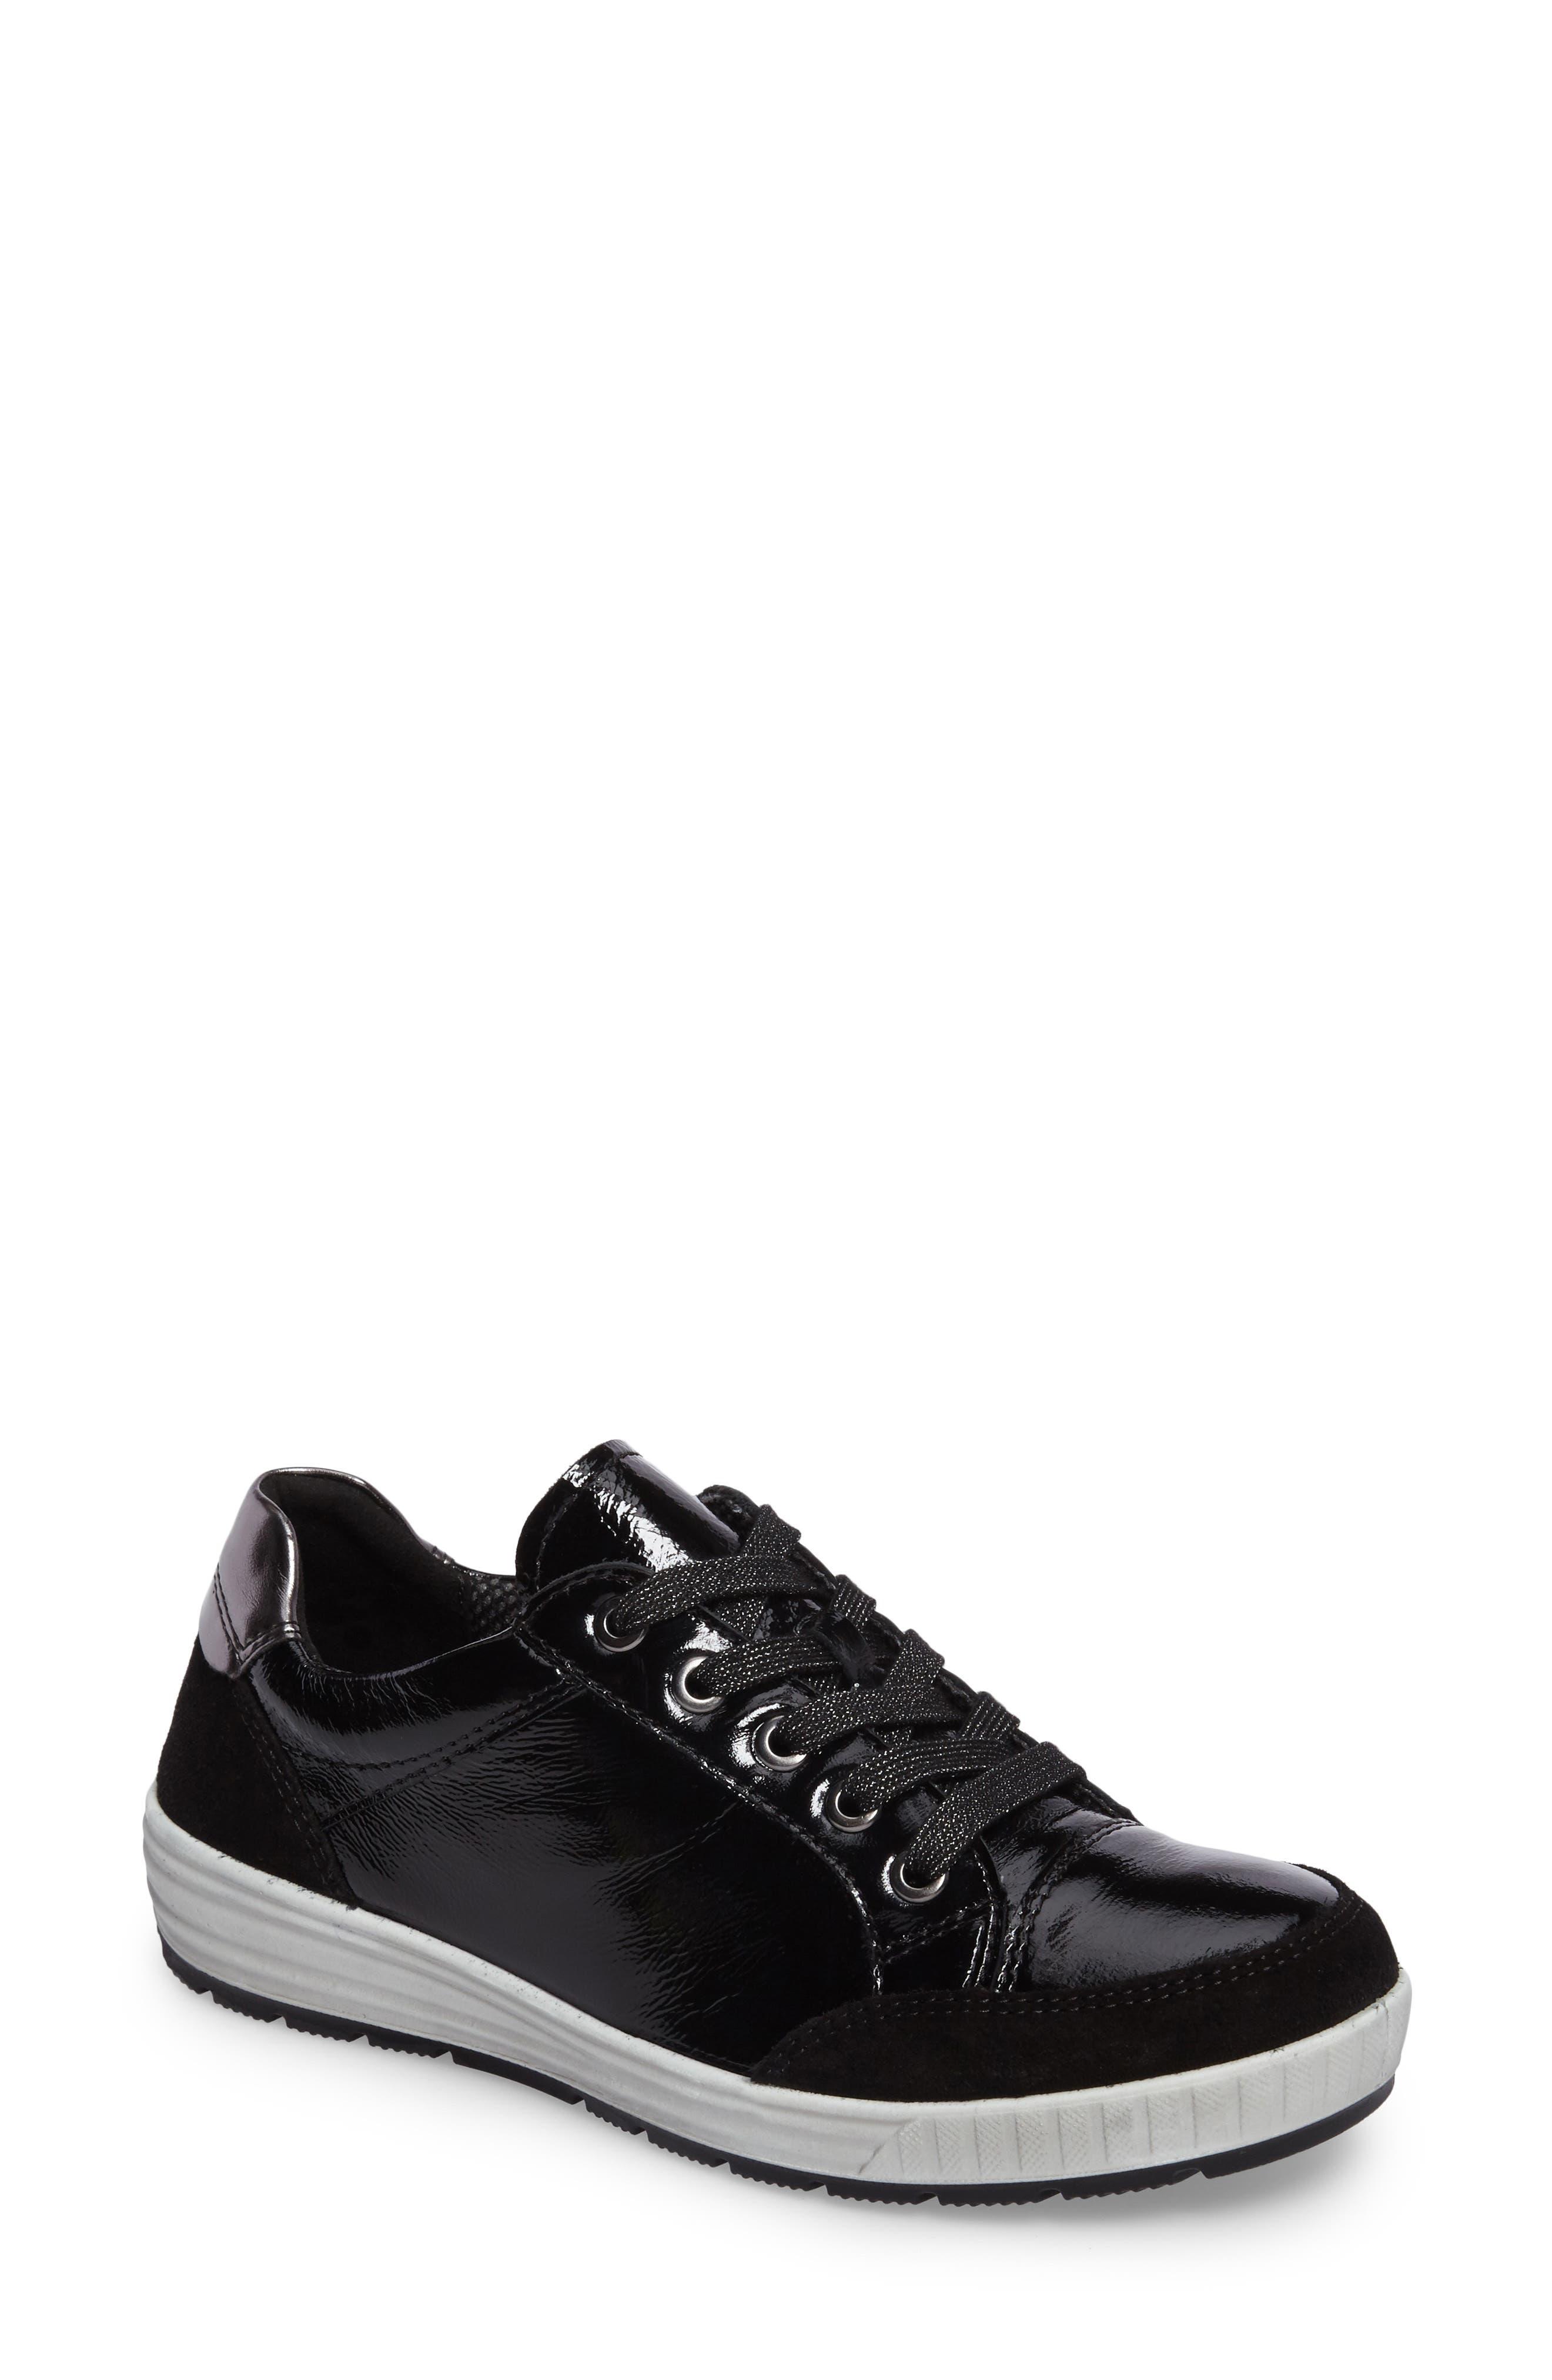 Nicole Sneaker,                         Main,                         color, BLACK LEATHER